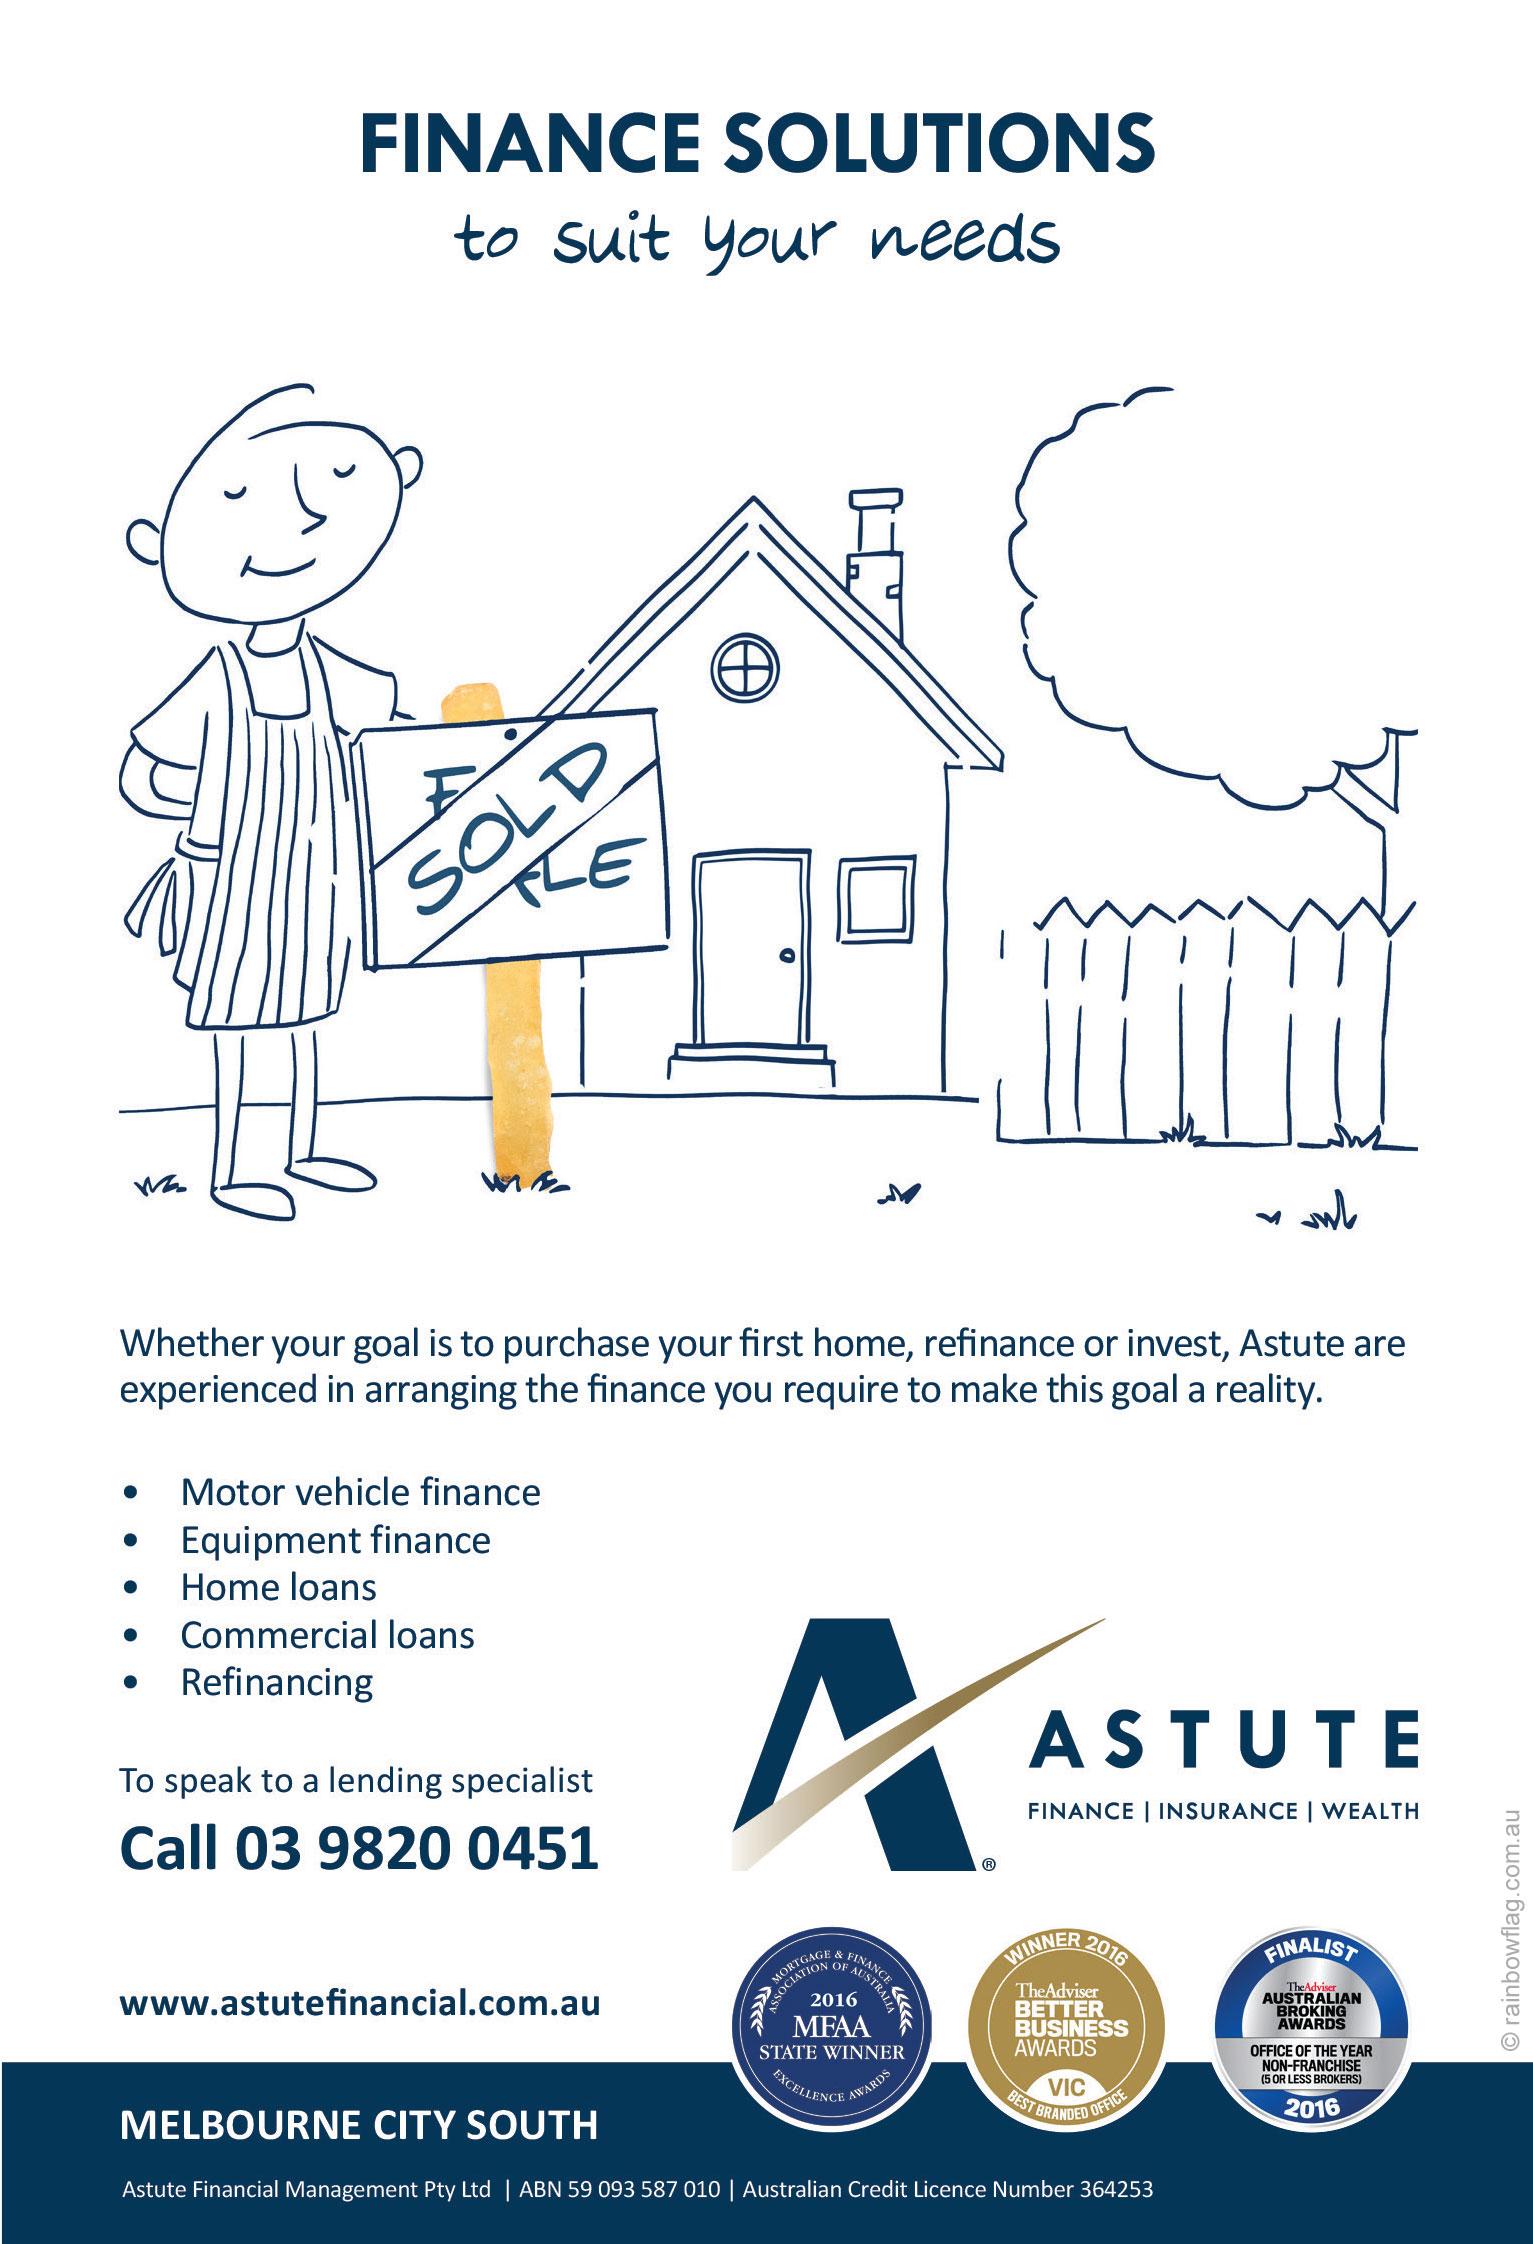 Astute Finance